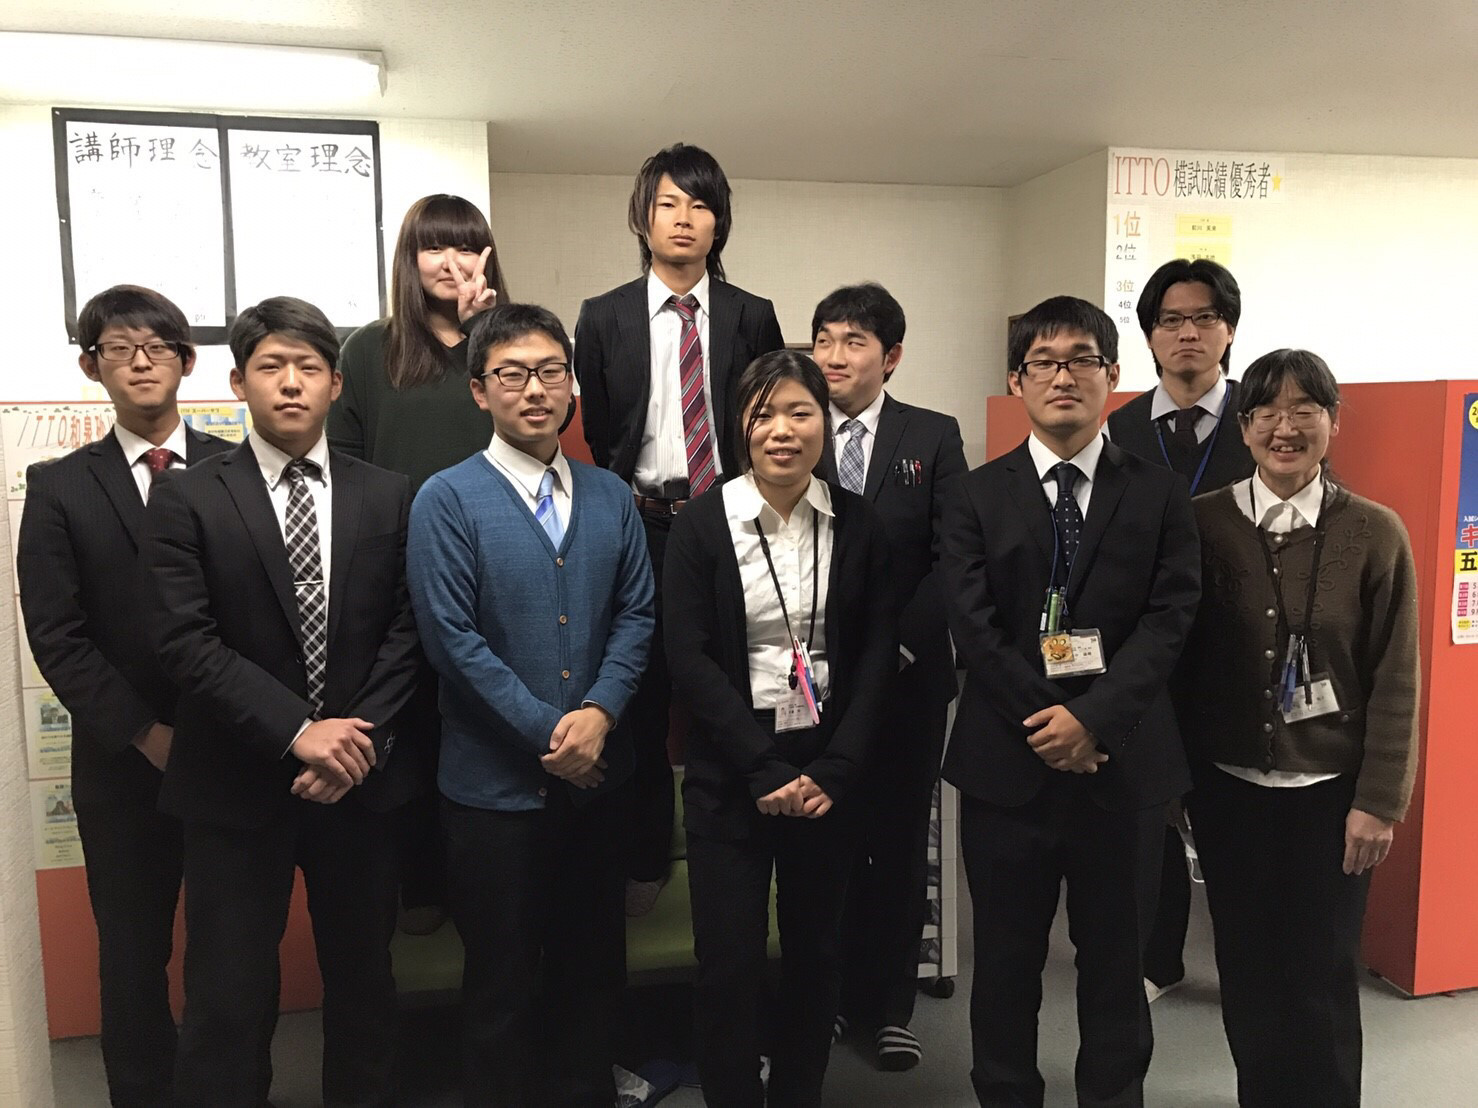 ITTO個別指導学院 泉佐野中央校のアルバイト情報